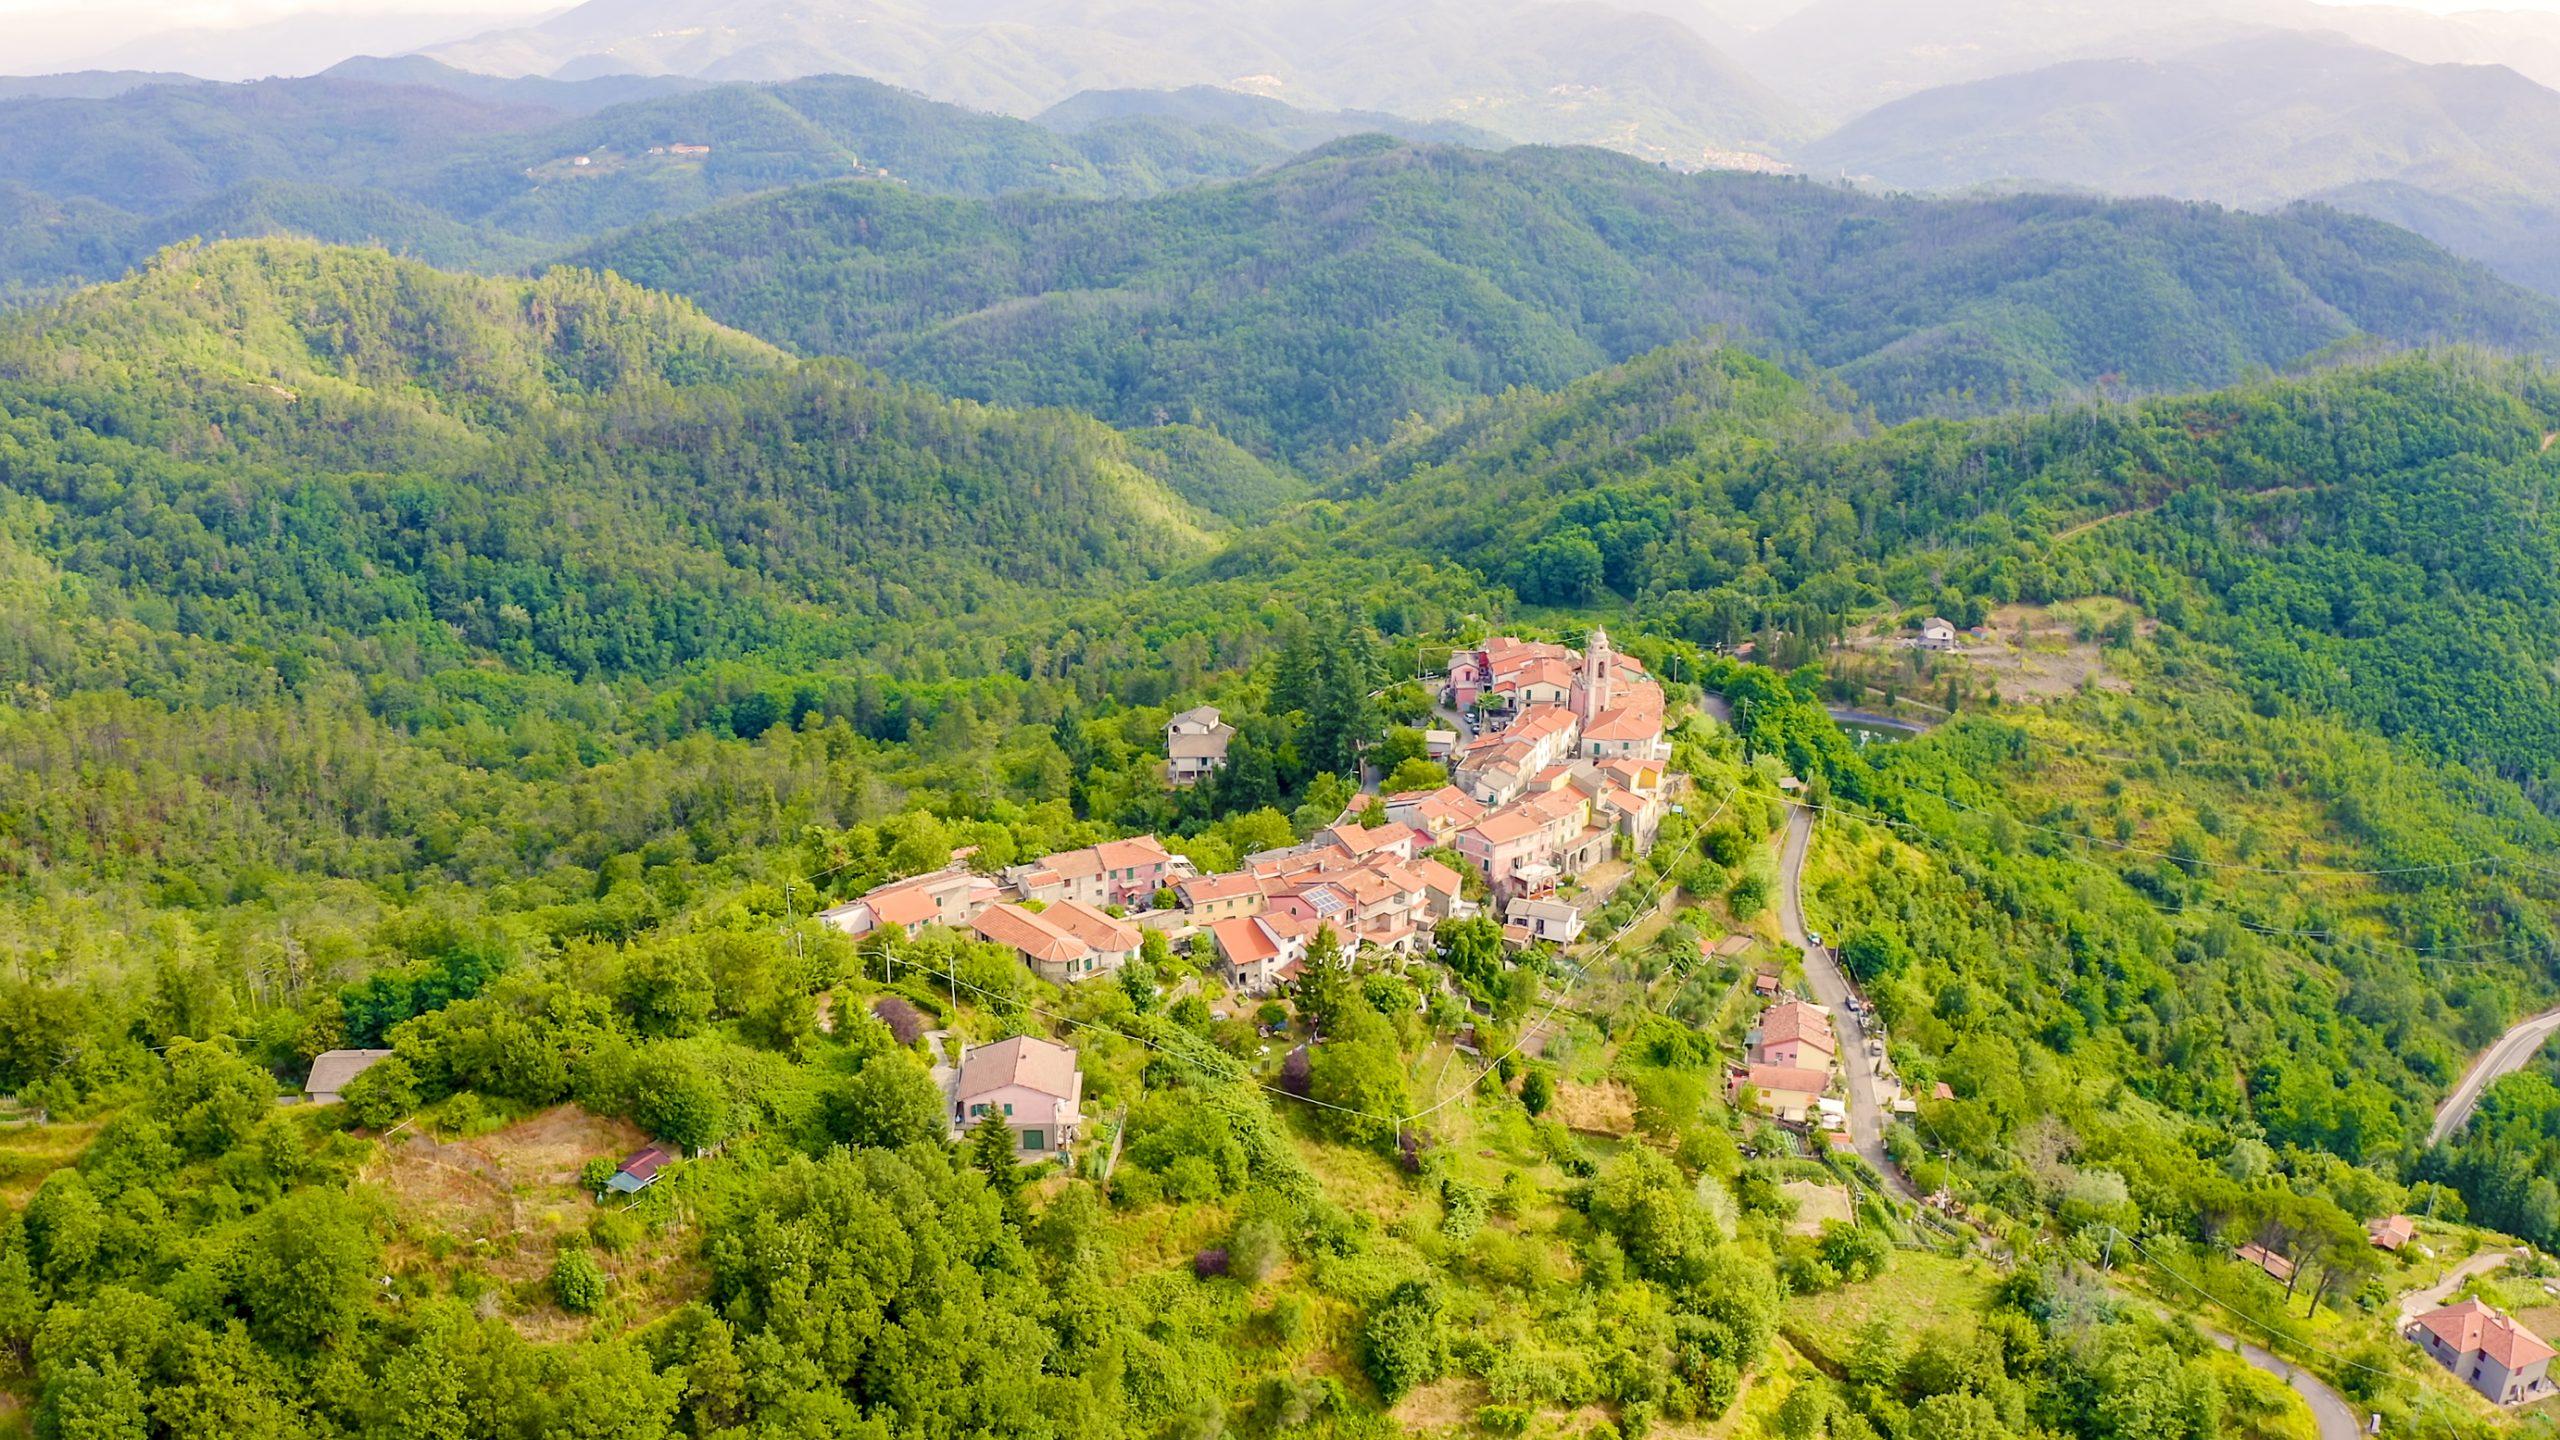 posti da vedere in italia carrodano-val-di-vara-liguria-shutterstock_1626367792